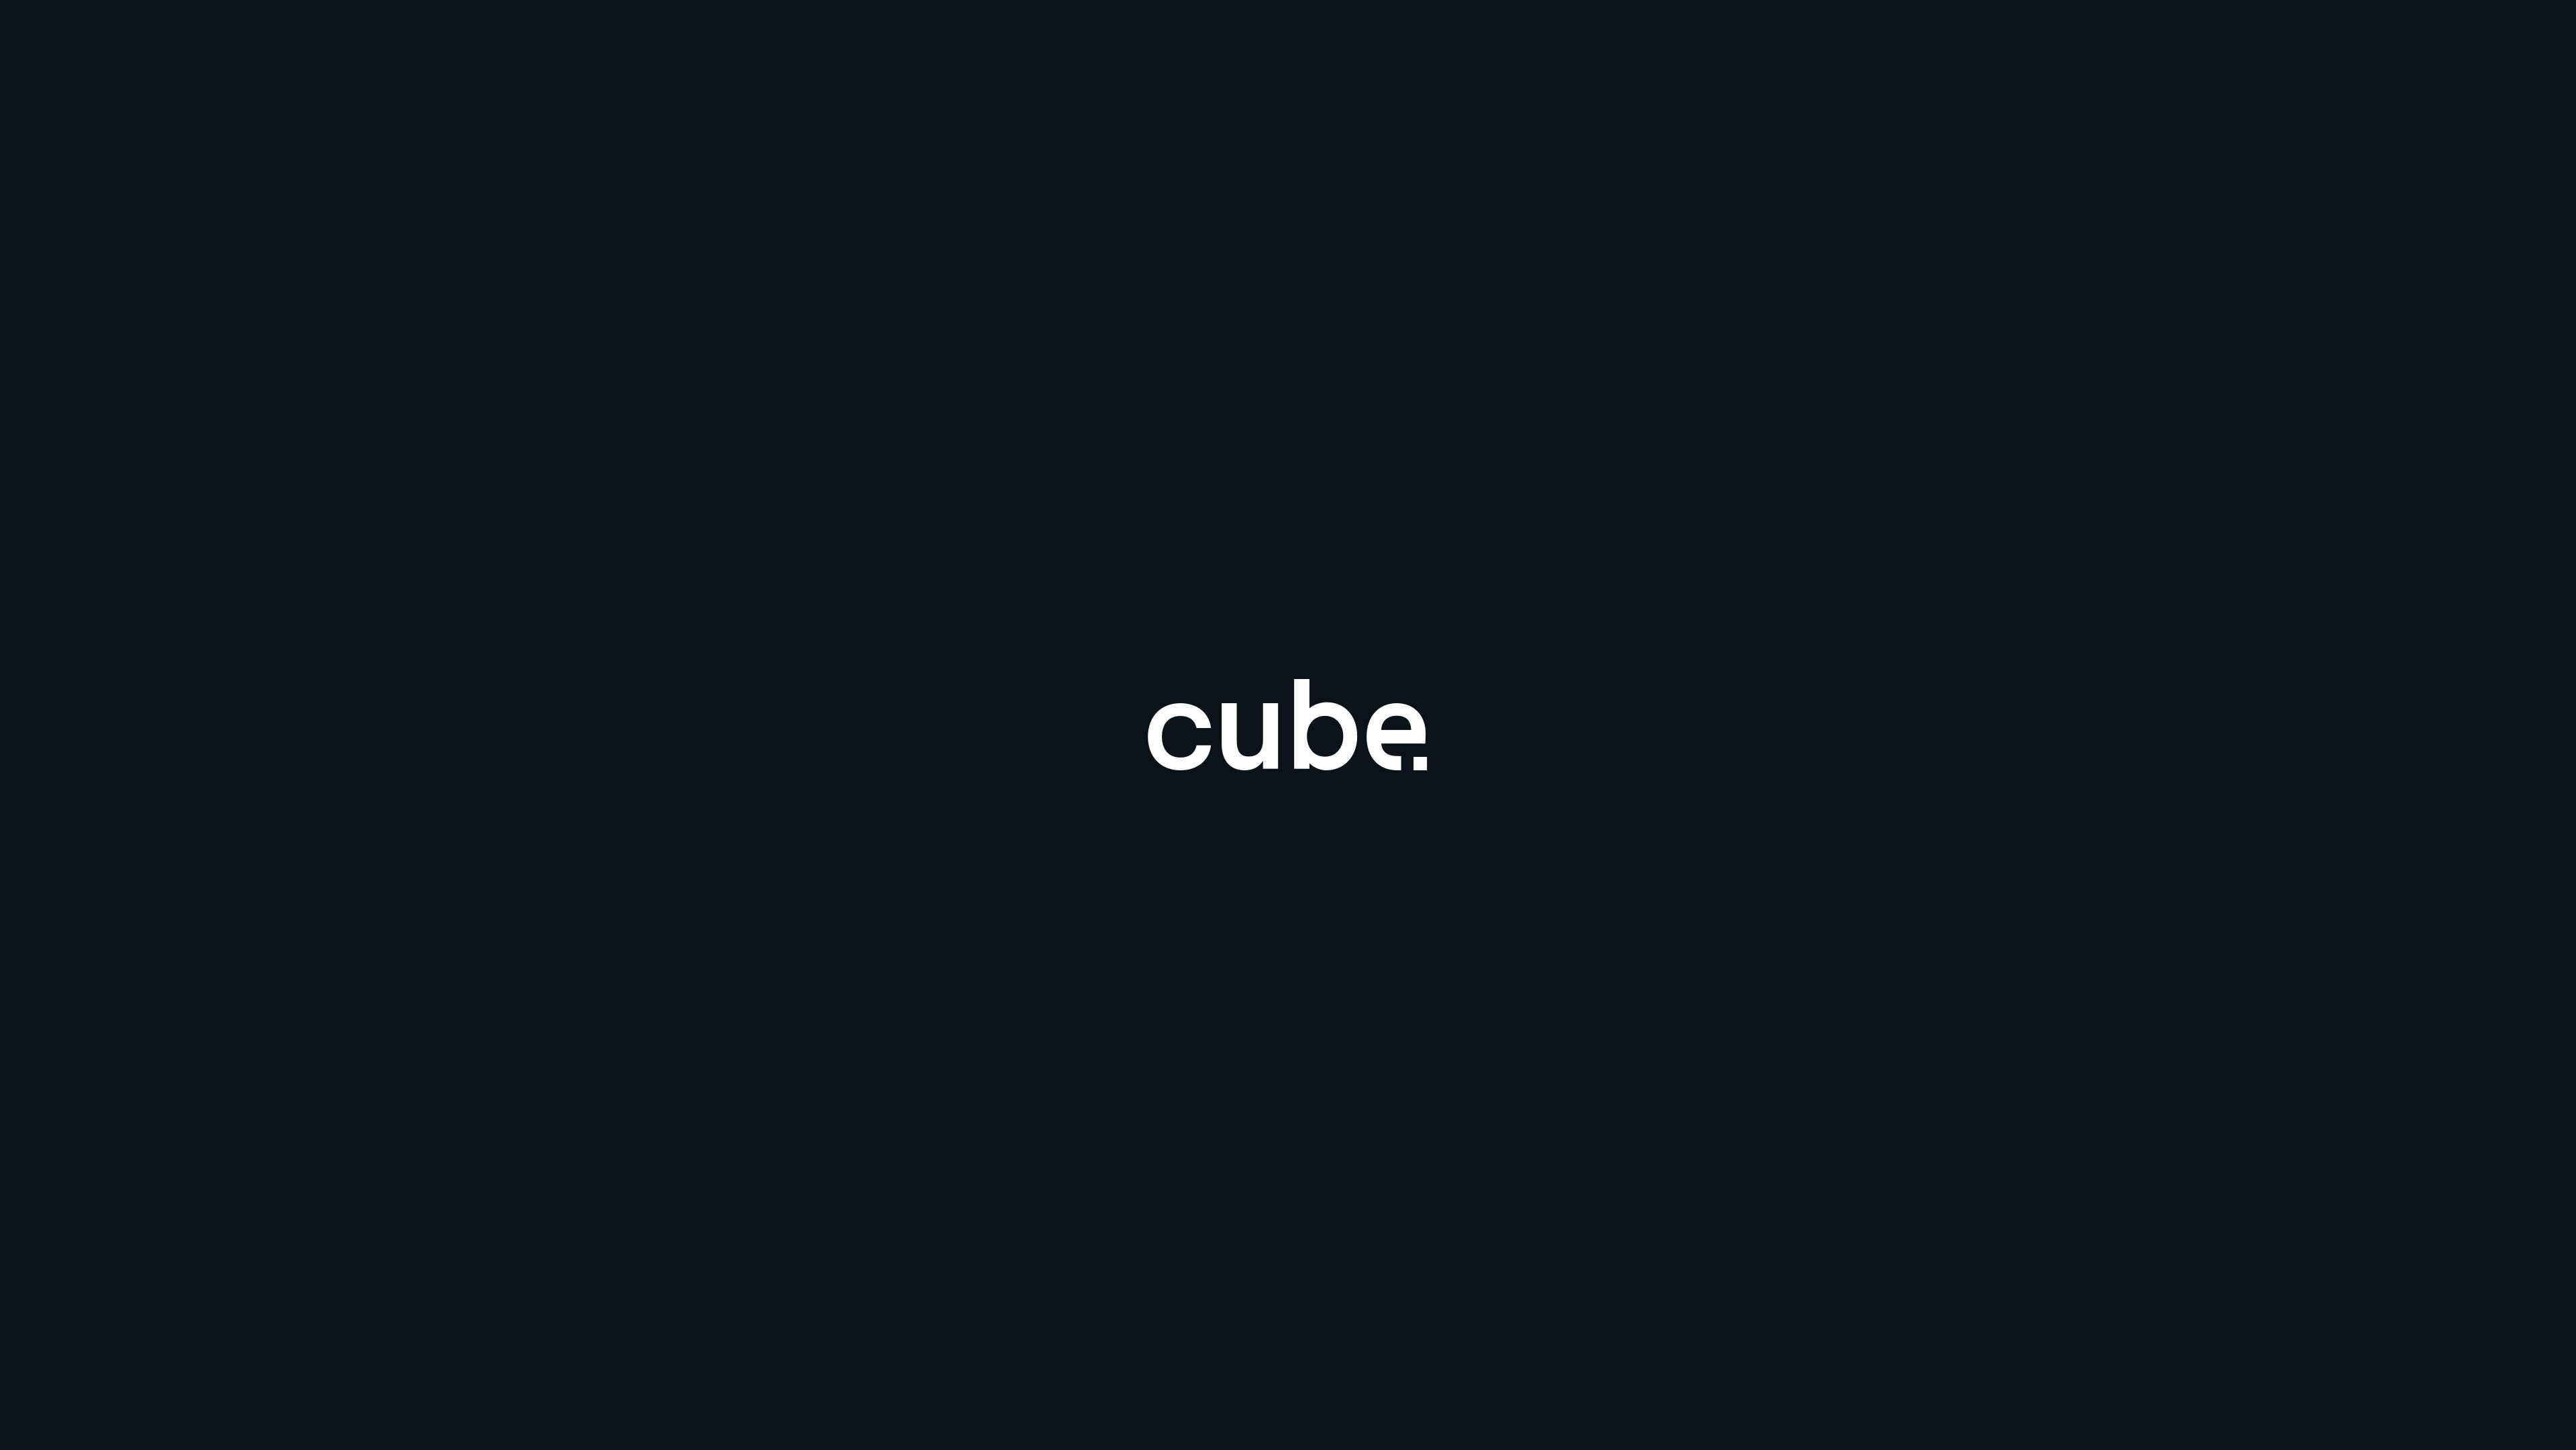 Cube nieuws foto